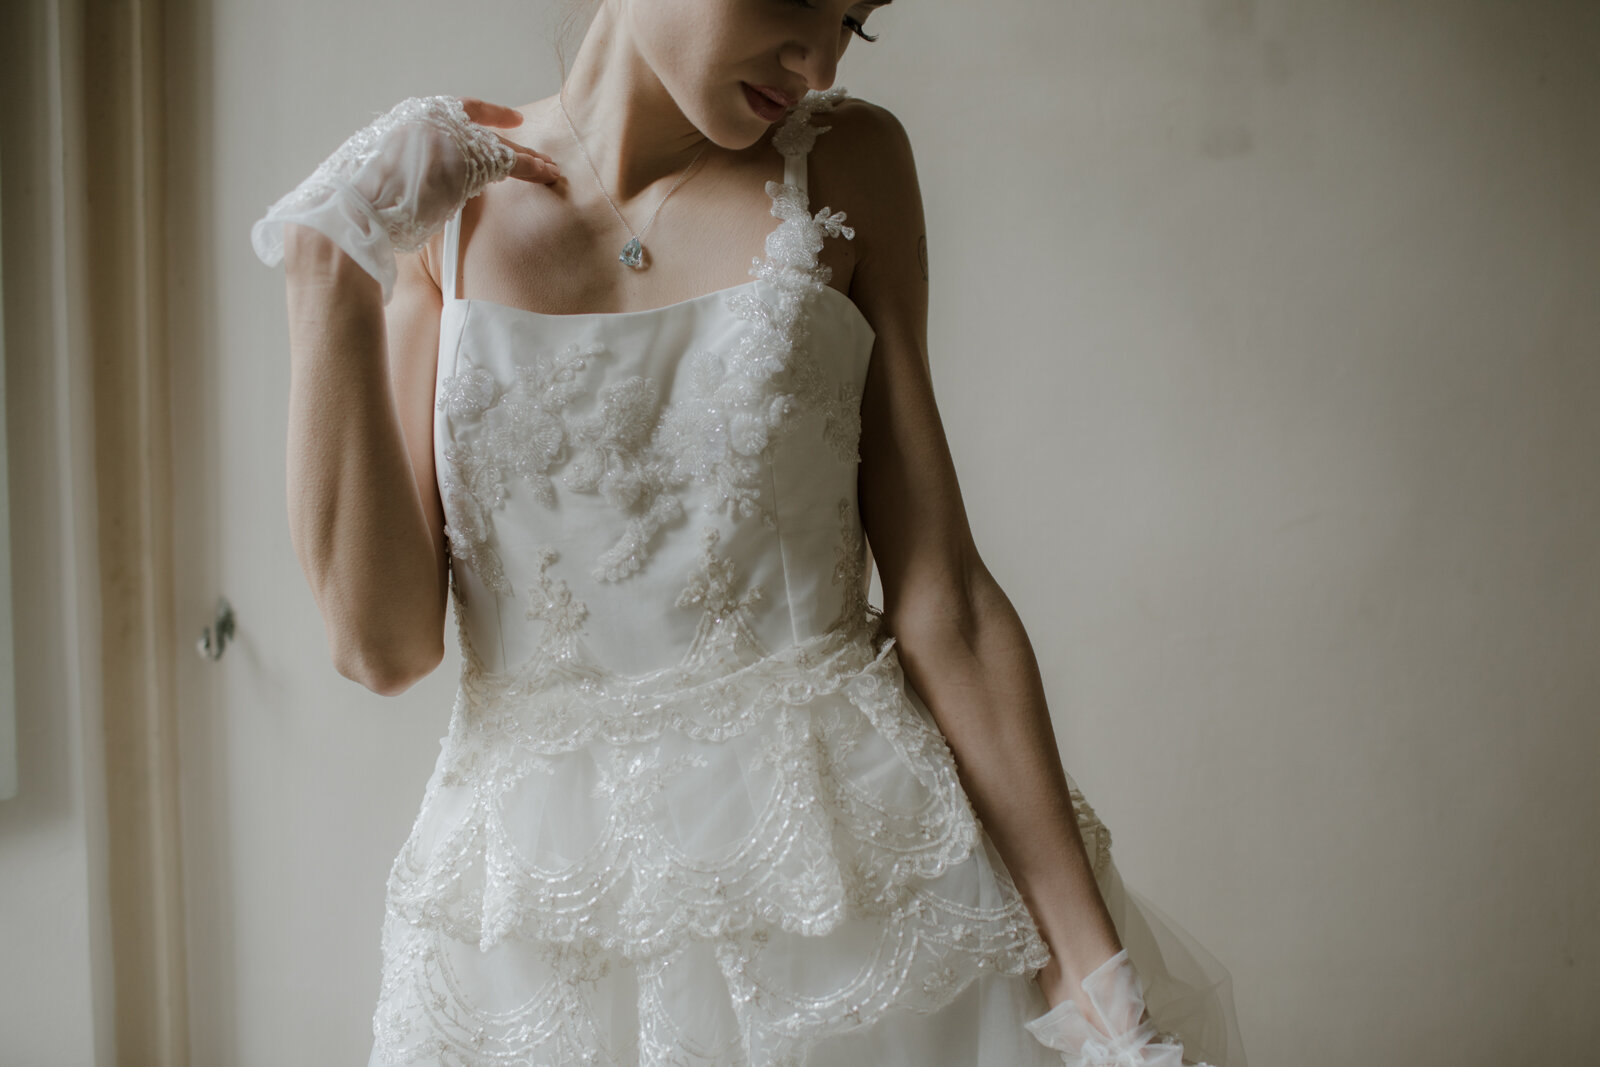 FCMAISON_BRIDE_VANESSAILLI_MOD_b-34.jpg